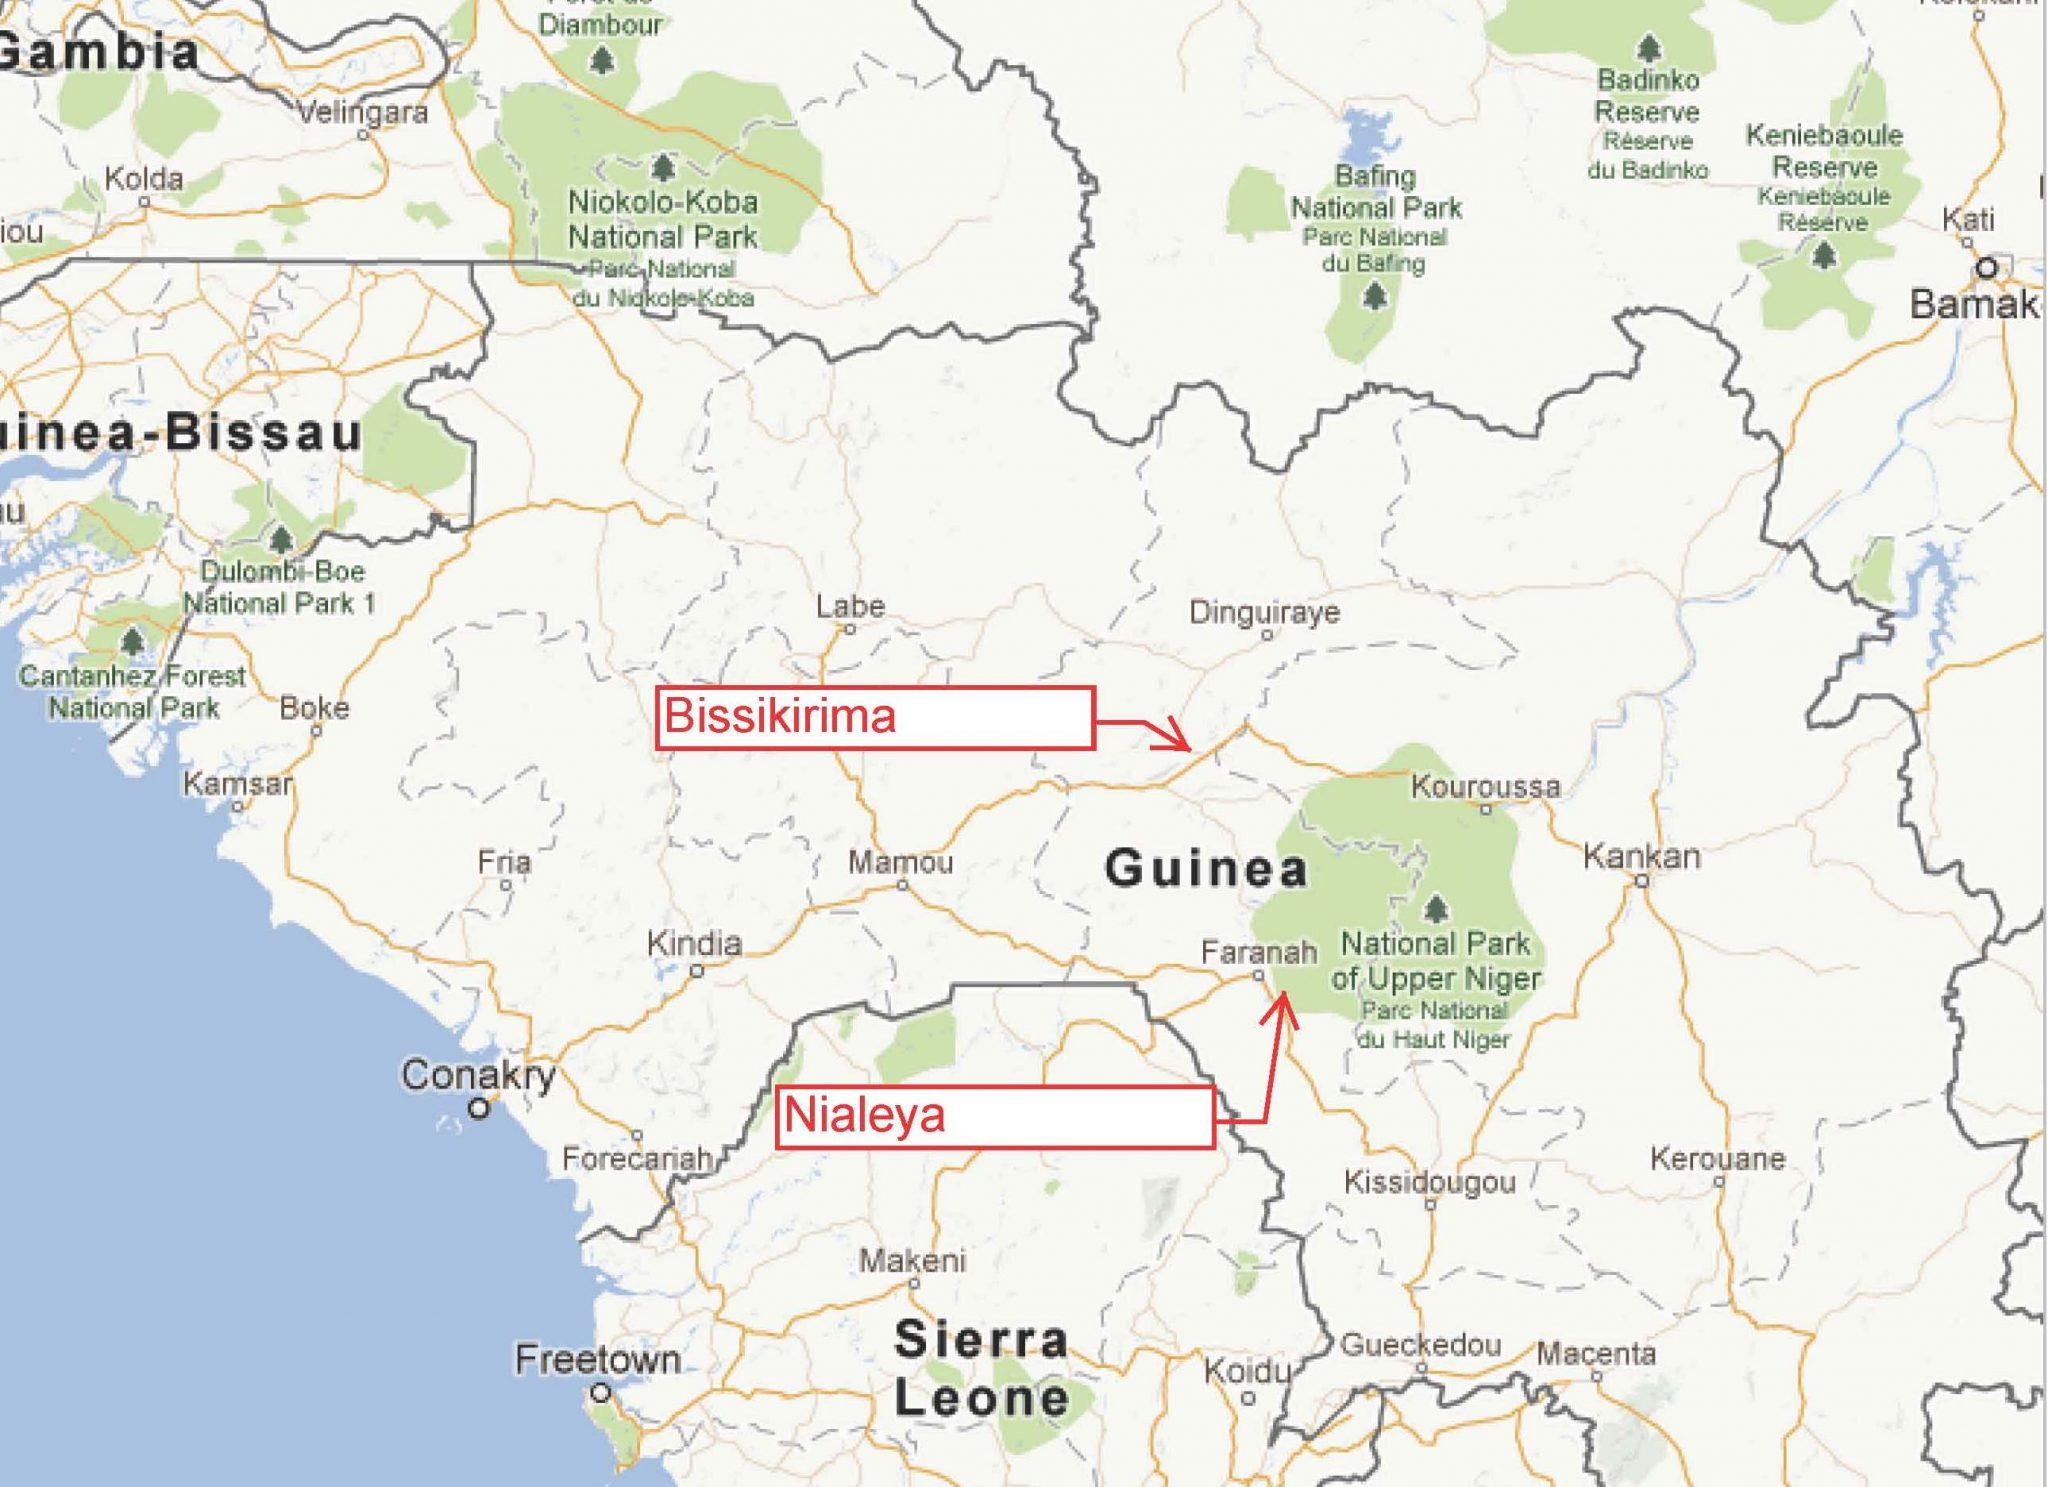 Villages of Bissikirima and Nialeya